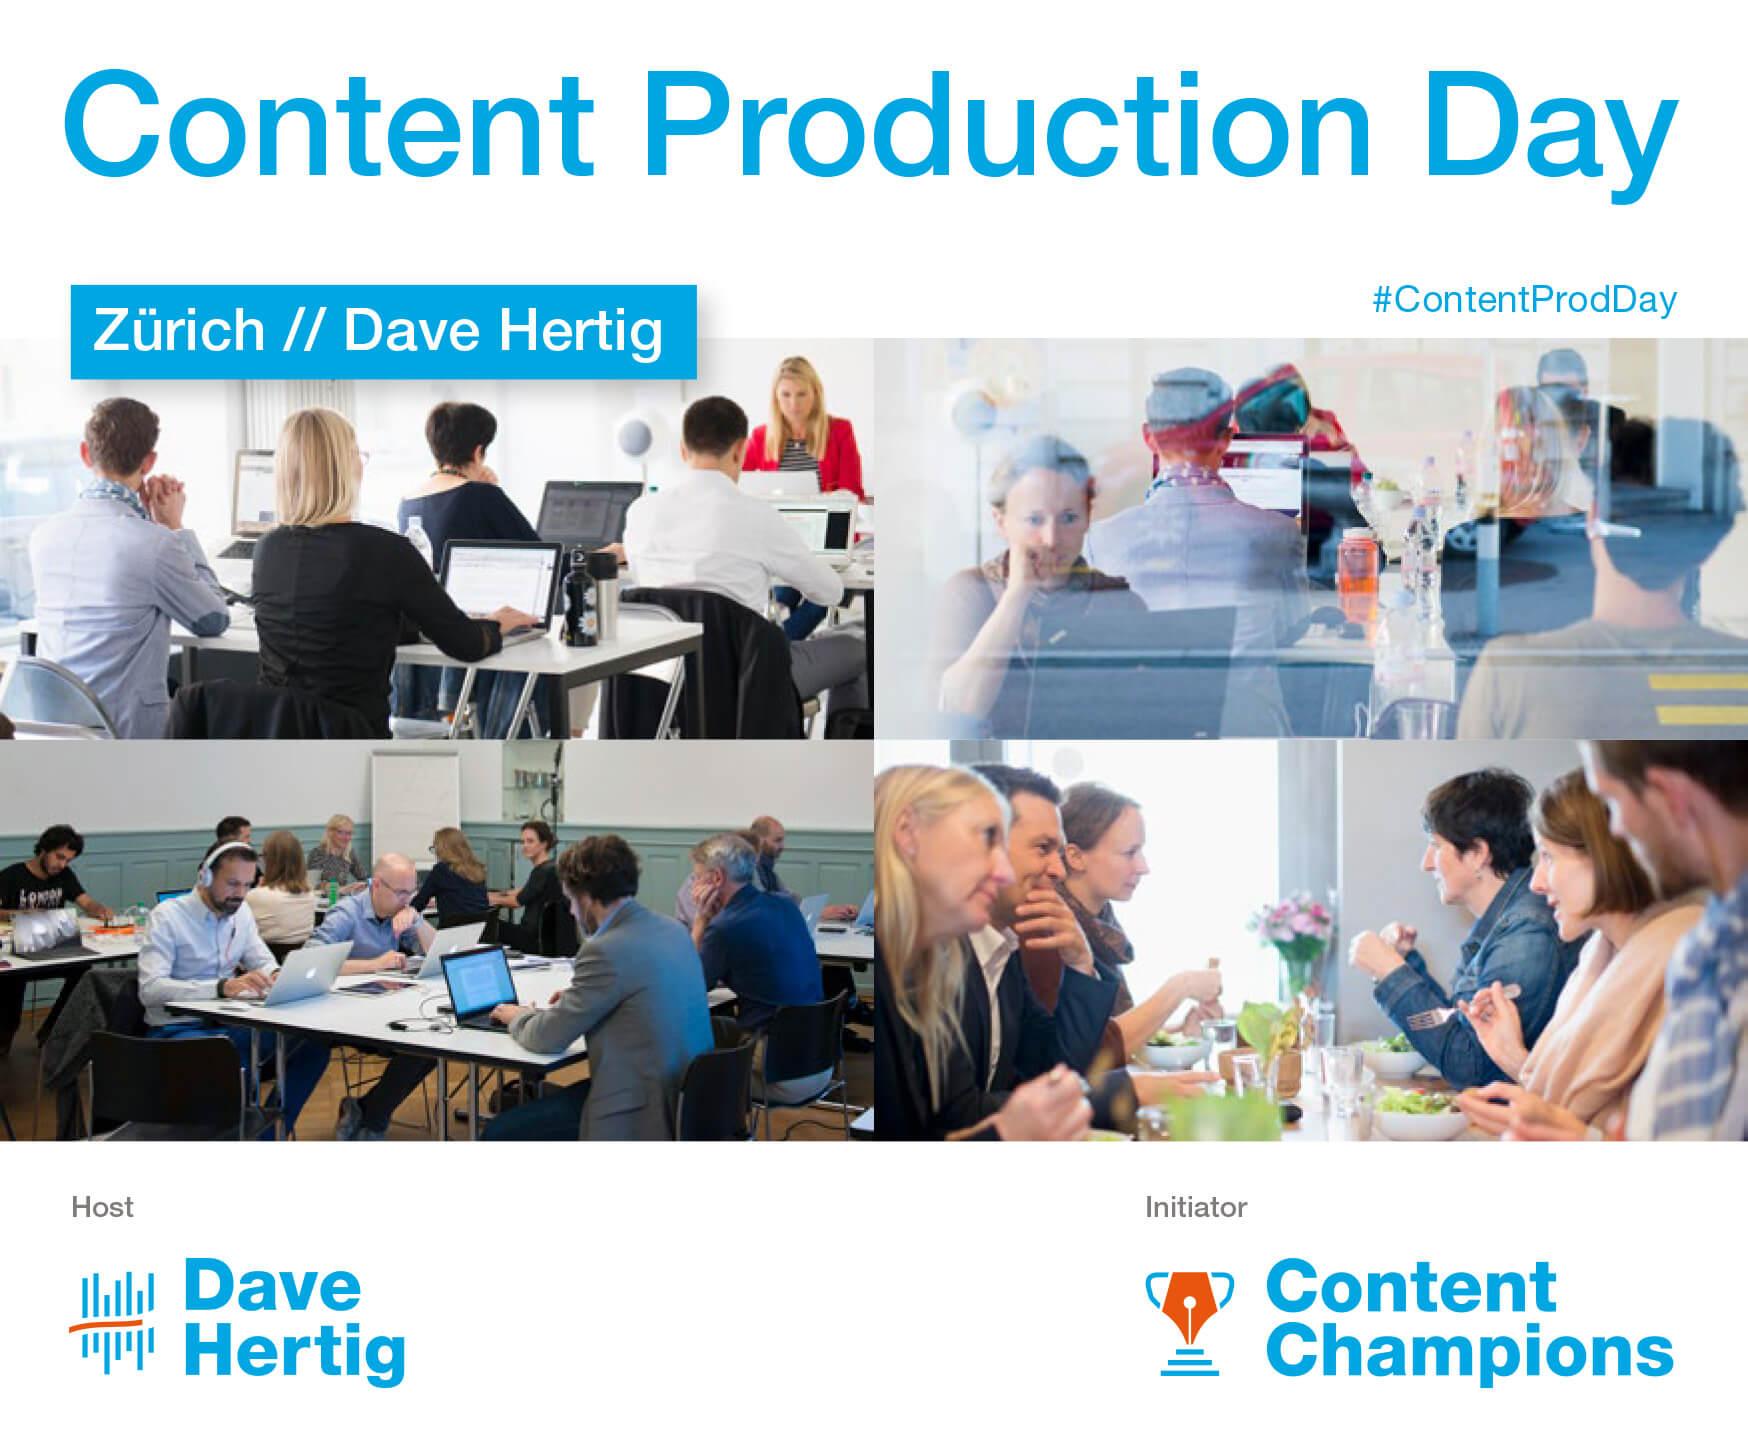 Content Production Day Zürich Dave Hertig > key visual